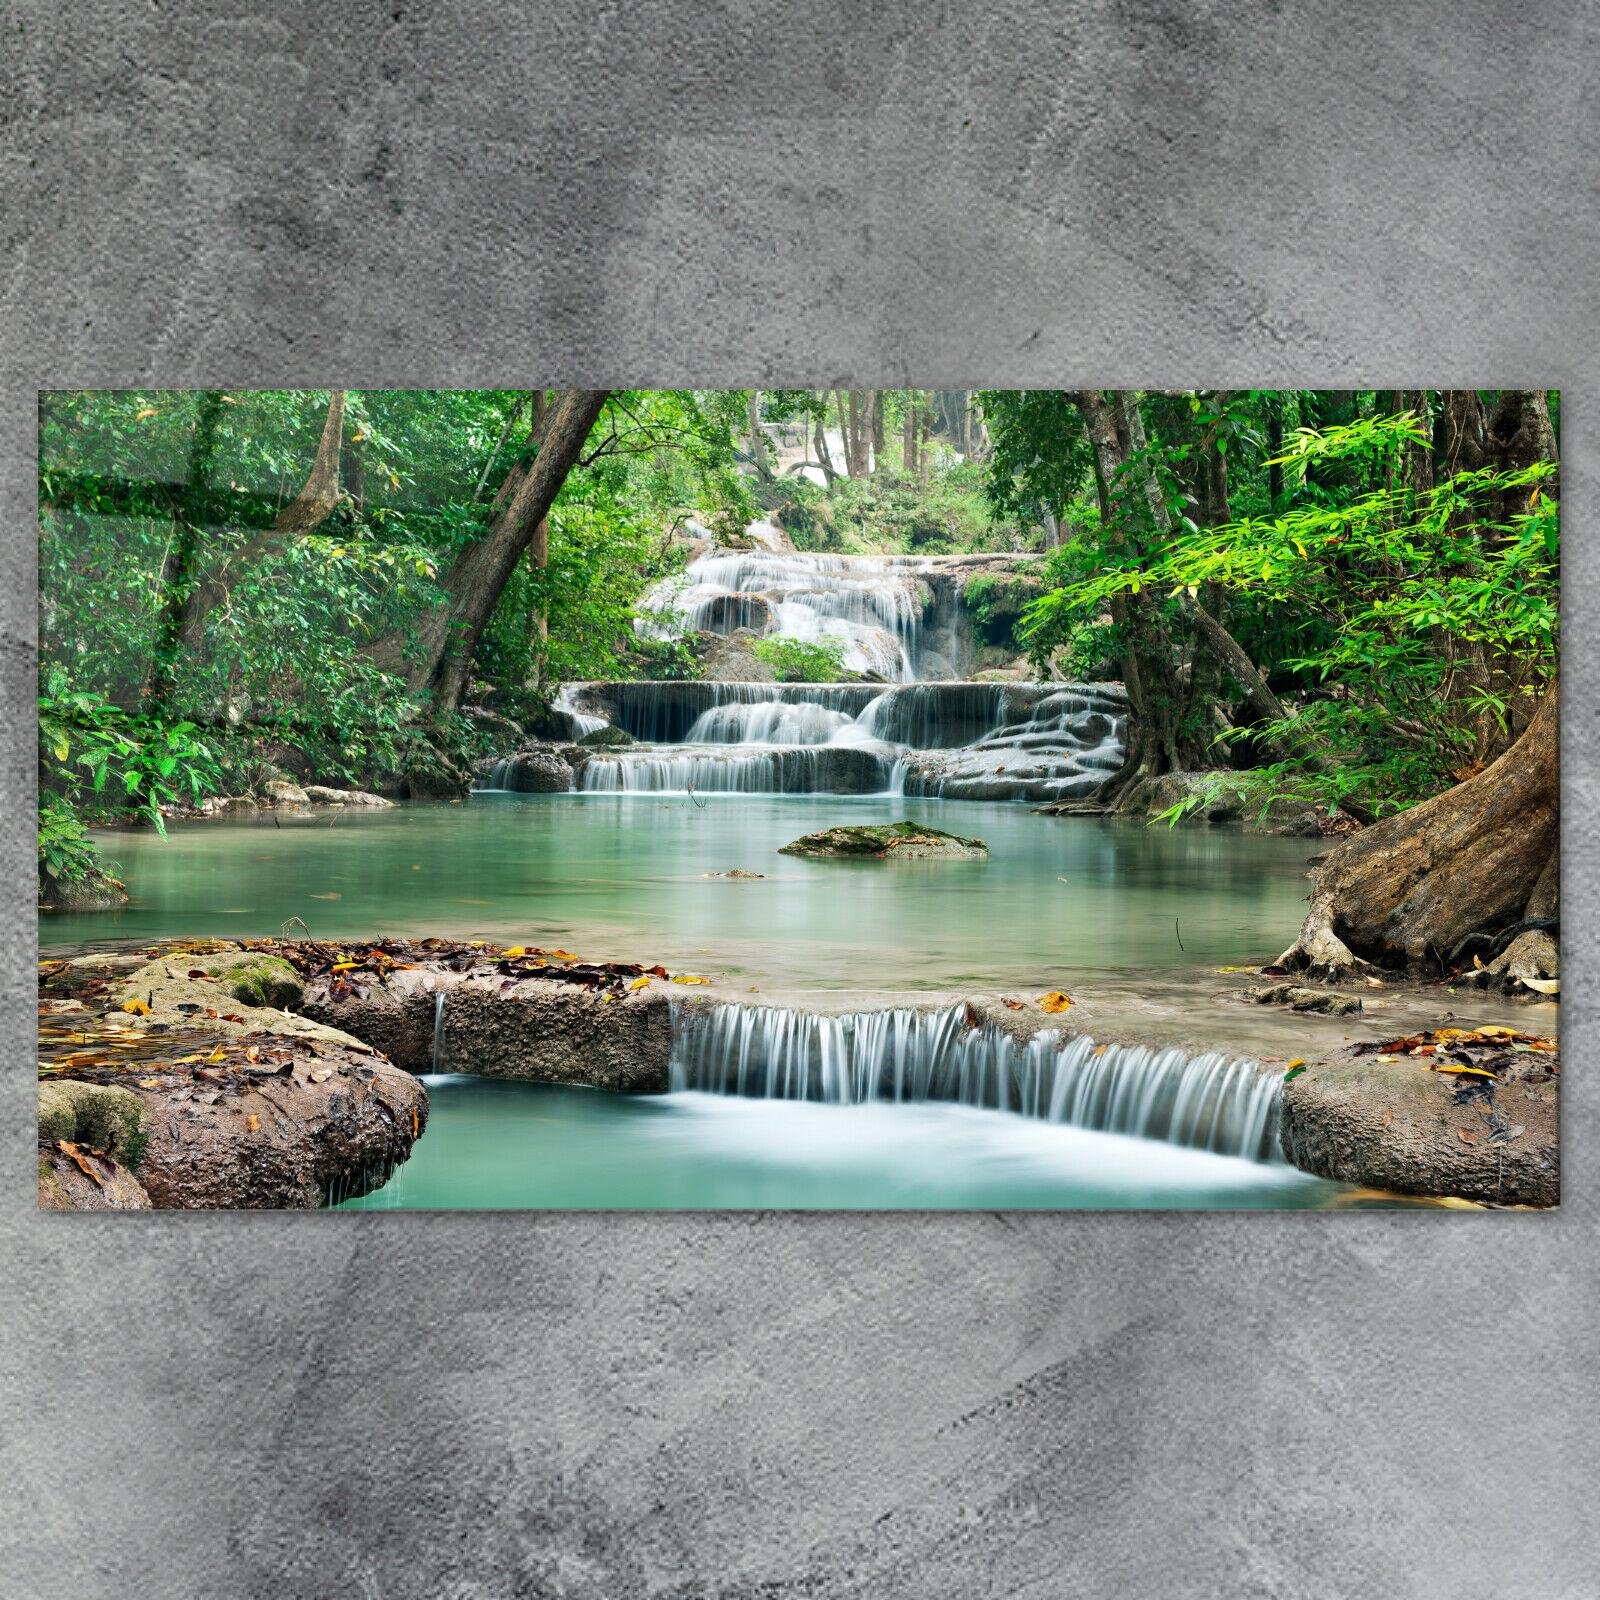 Glasbild Natur - viele Größen - Wandbild Spritzschutz Deko Wanddekoration